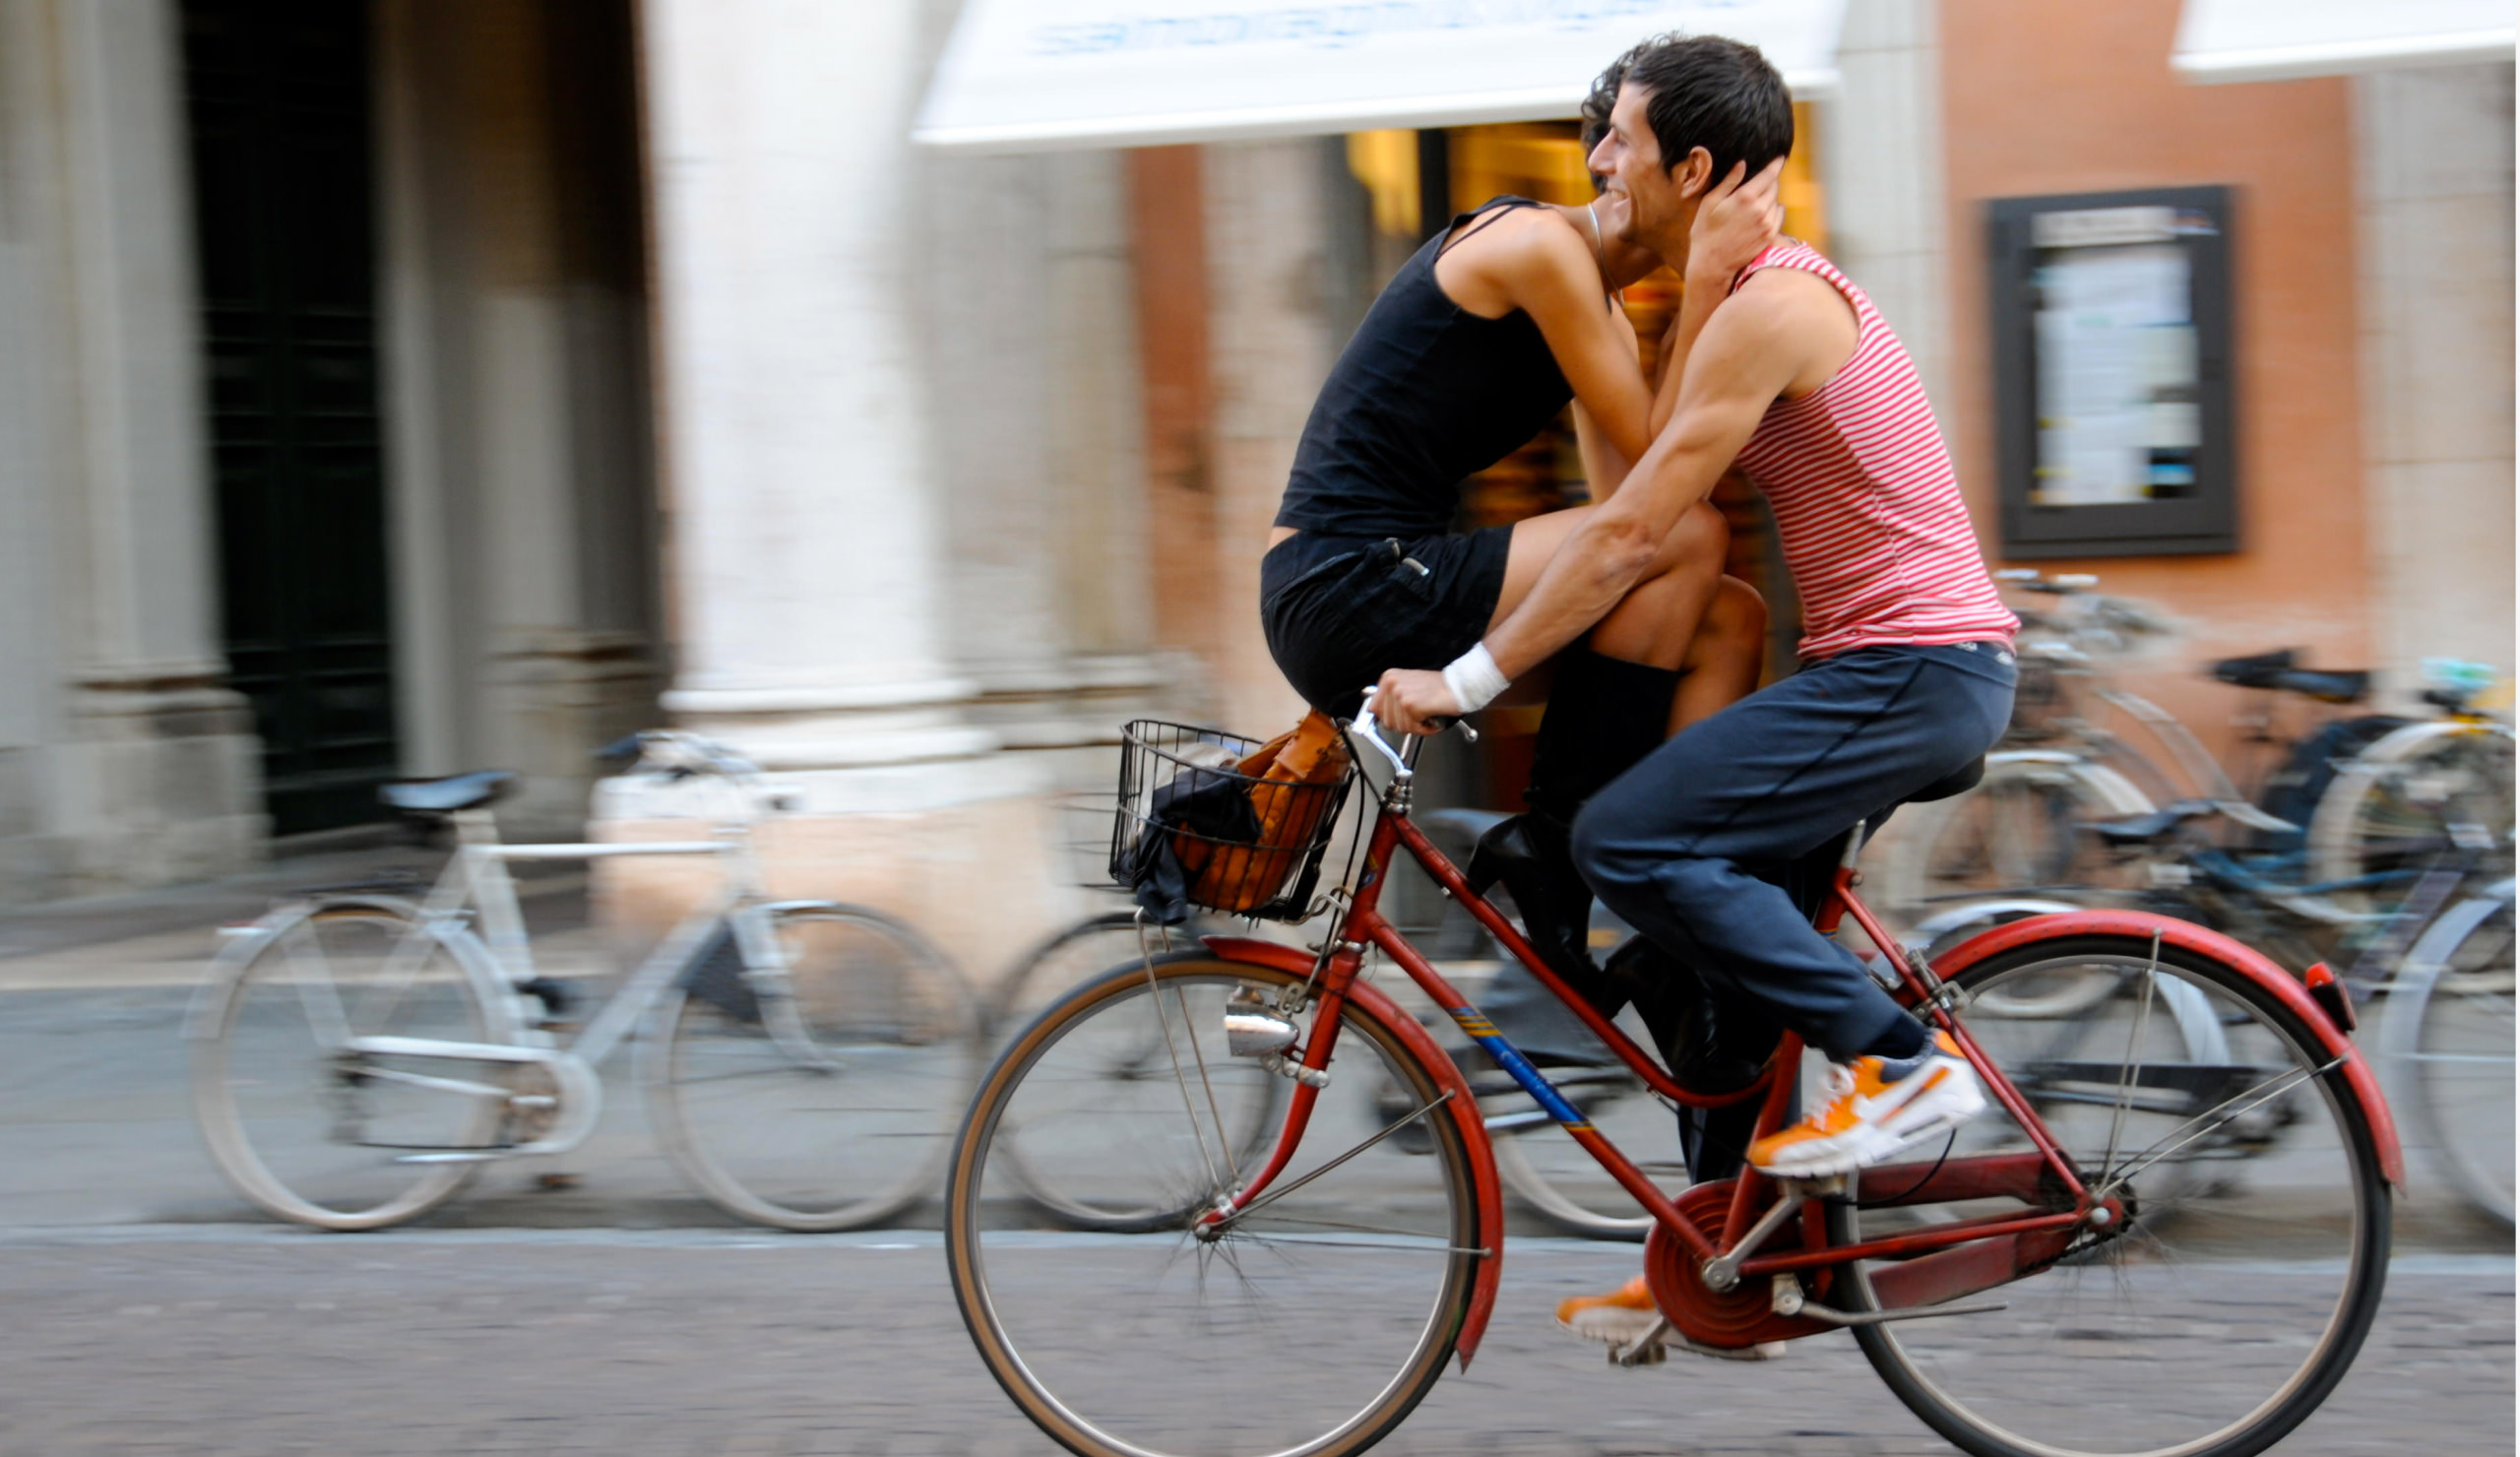 Bike riding in Ravenna, Italy